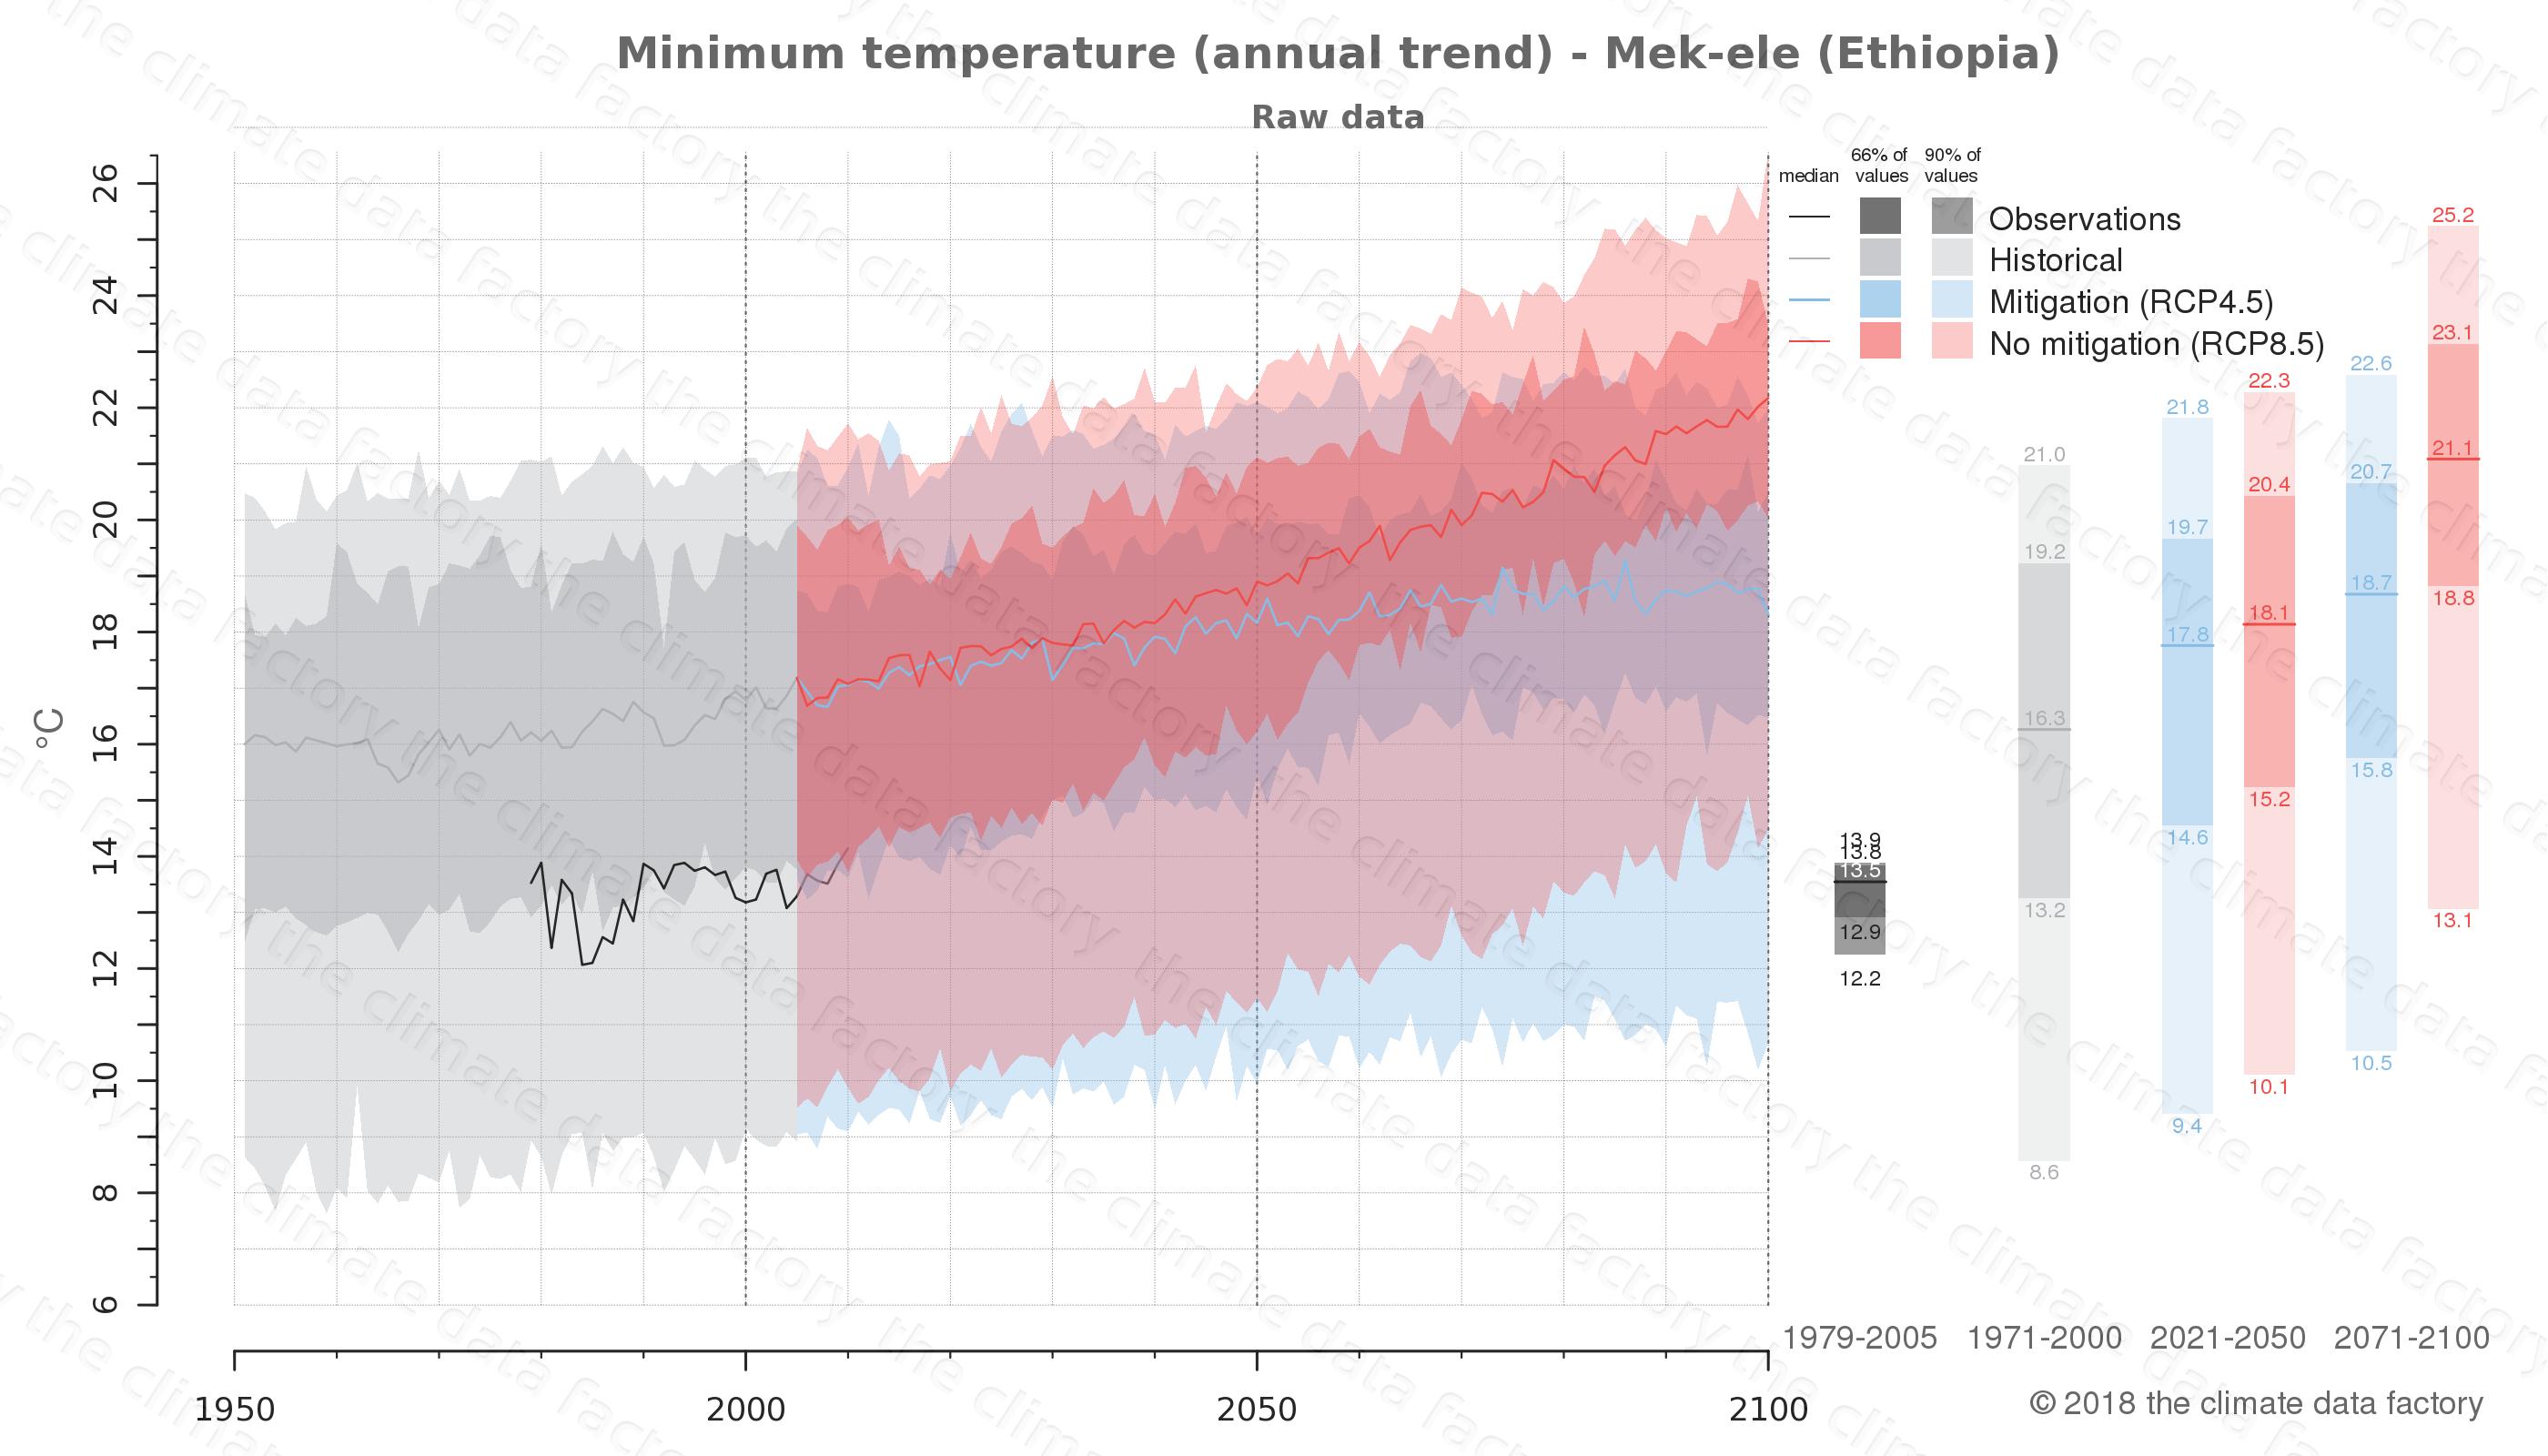 climate change data policy adaptation climate graph city data minimum-temperature mek-ele ethiopia